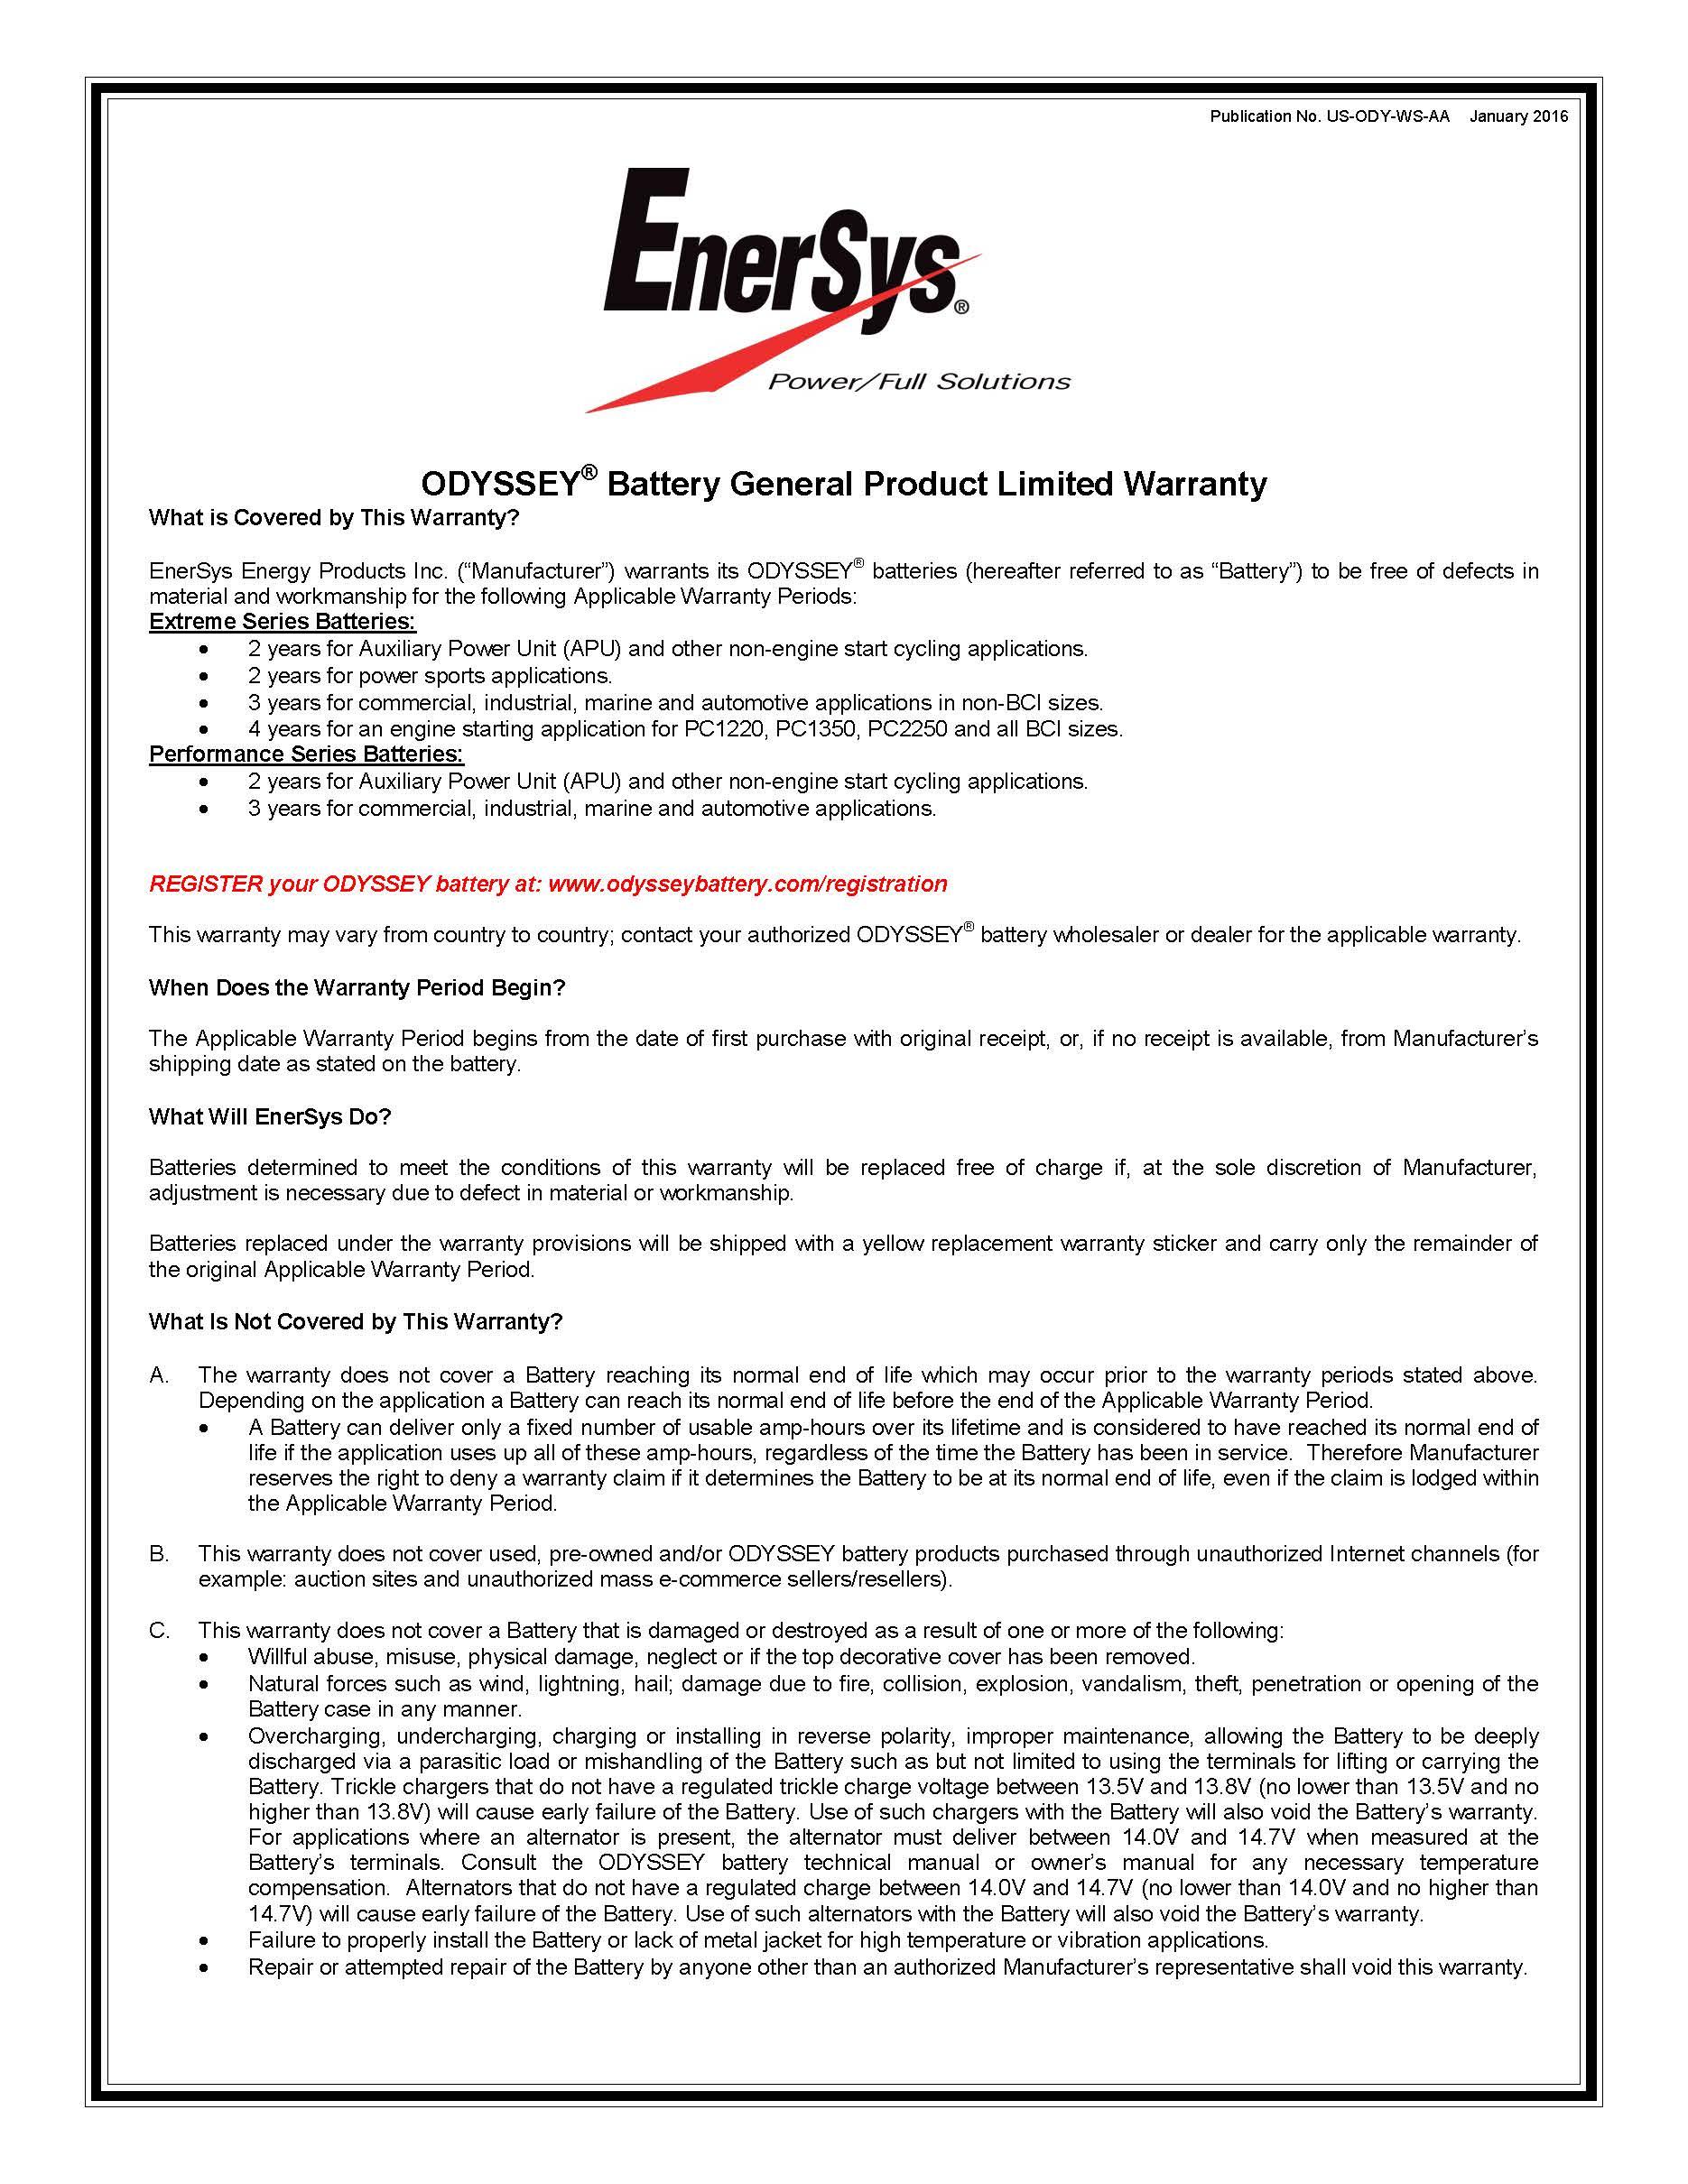 Odyssey warranty batterystore warranty page 1g altavistaventures Choice Image